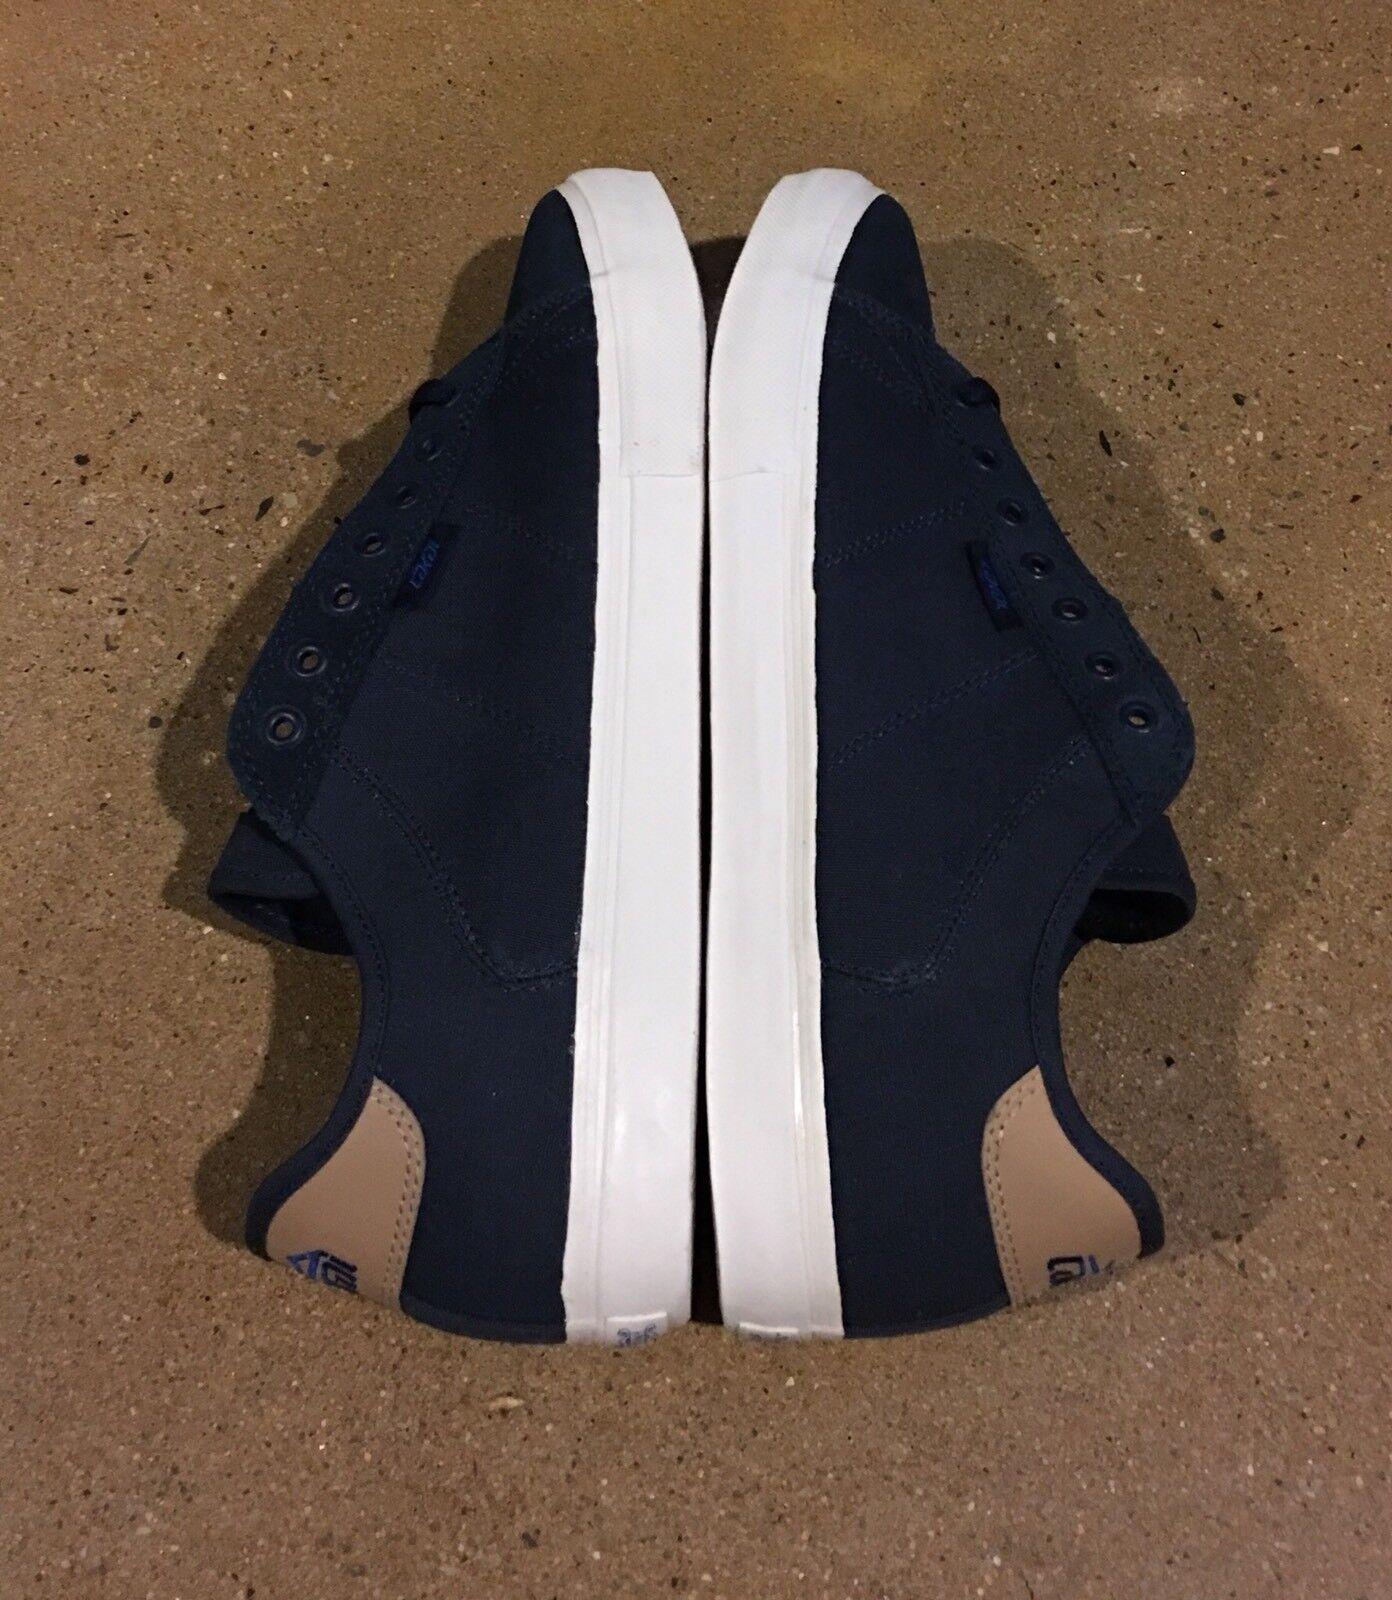 Lakai Howard Select Lean Series Size Navy Canvas BMX Skate Shoes Deadstock